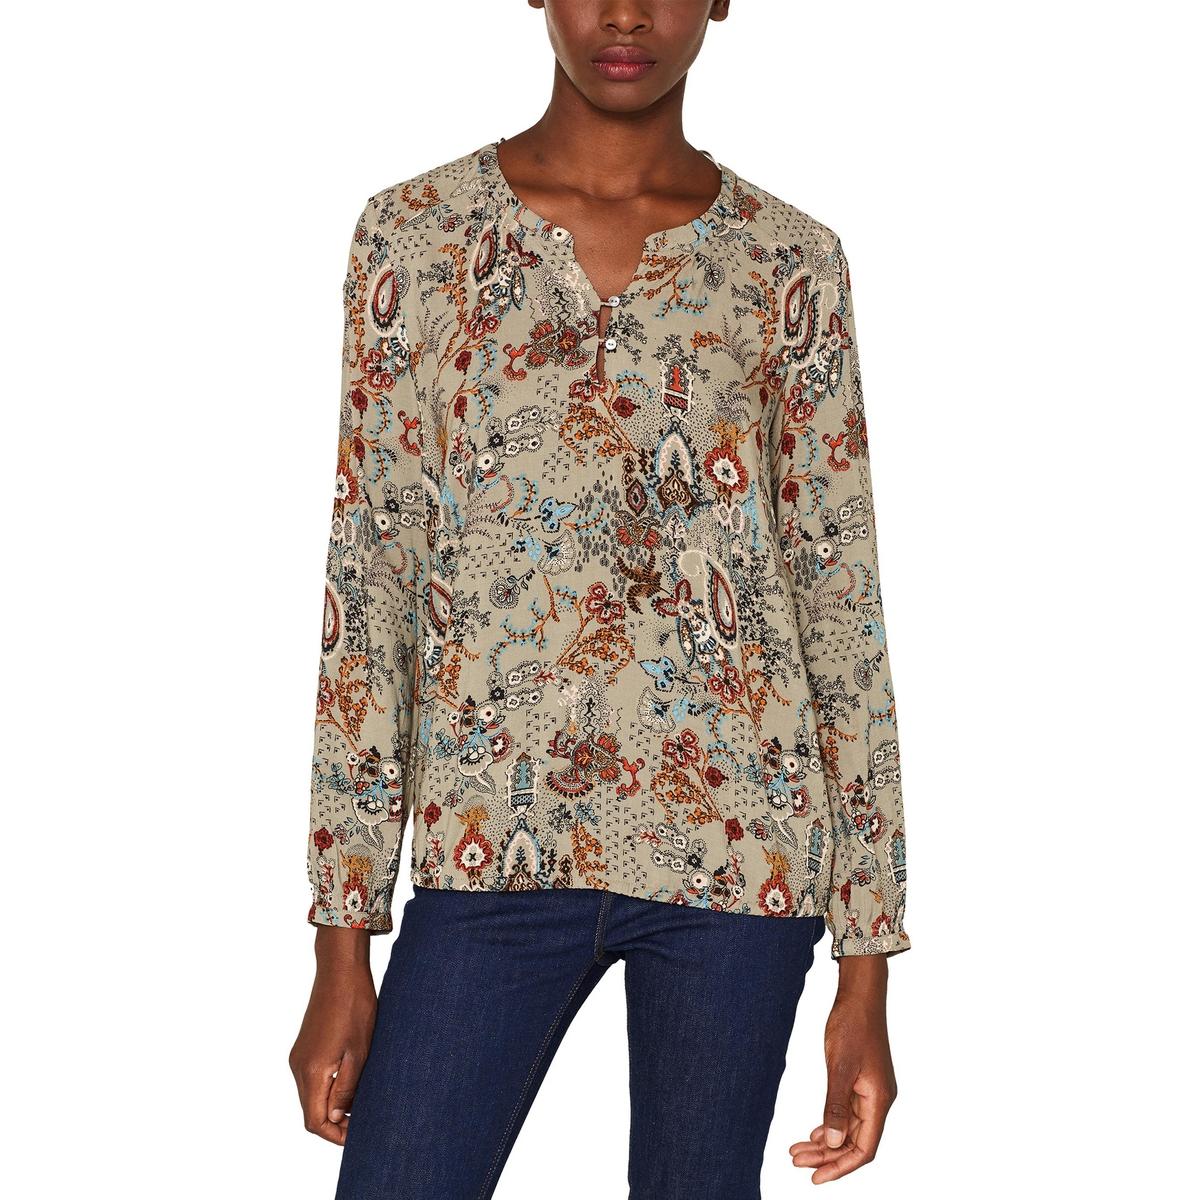 Blusa estampada con cuello tunecino de manga larga